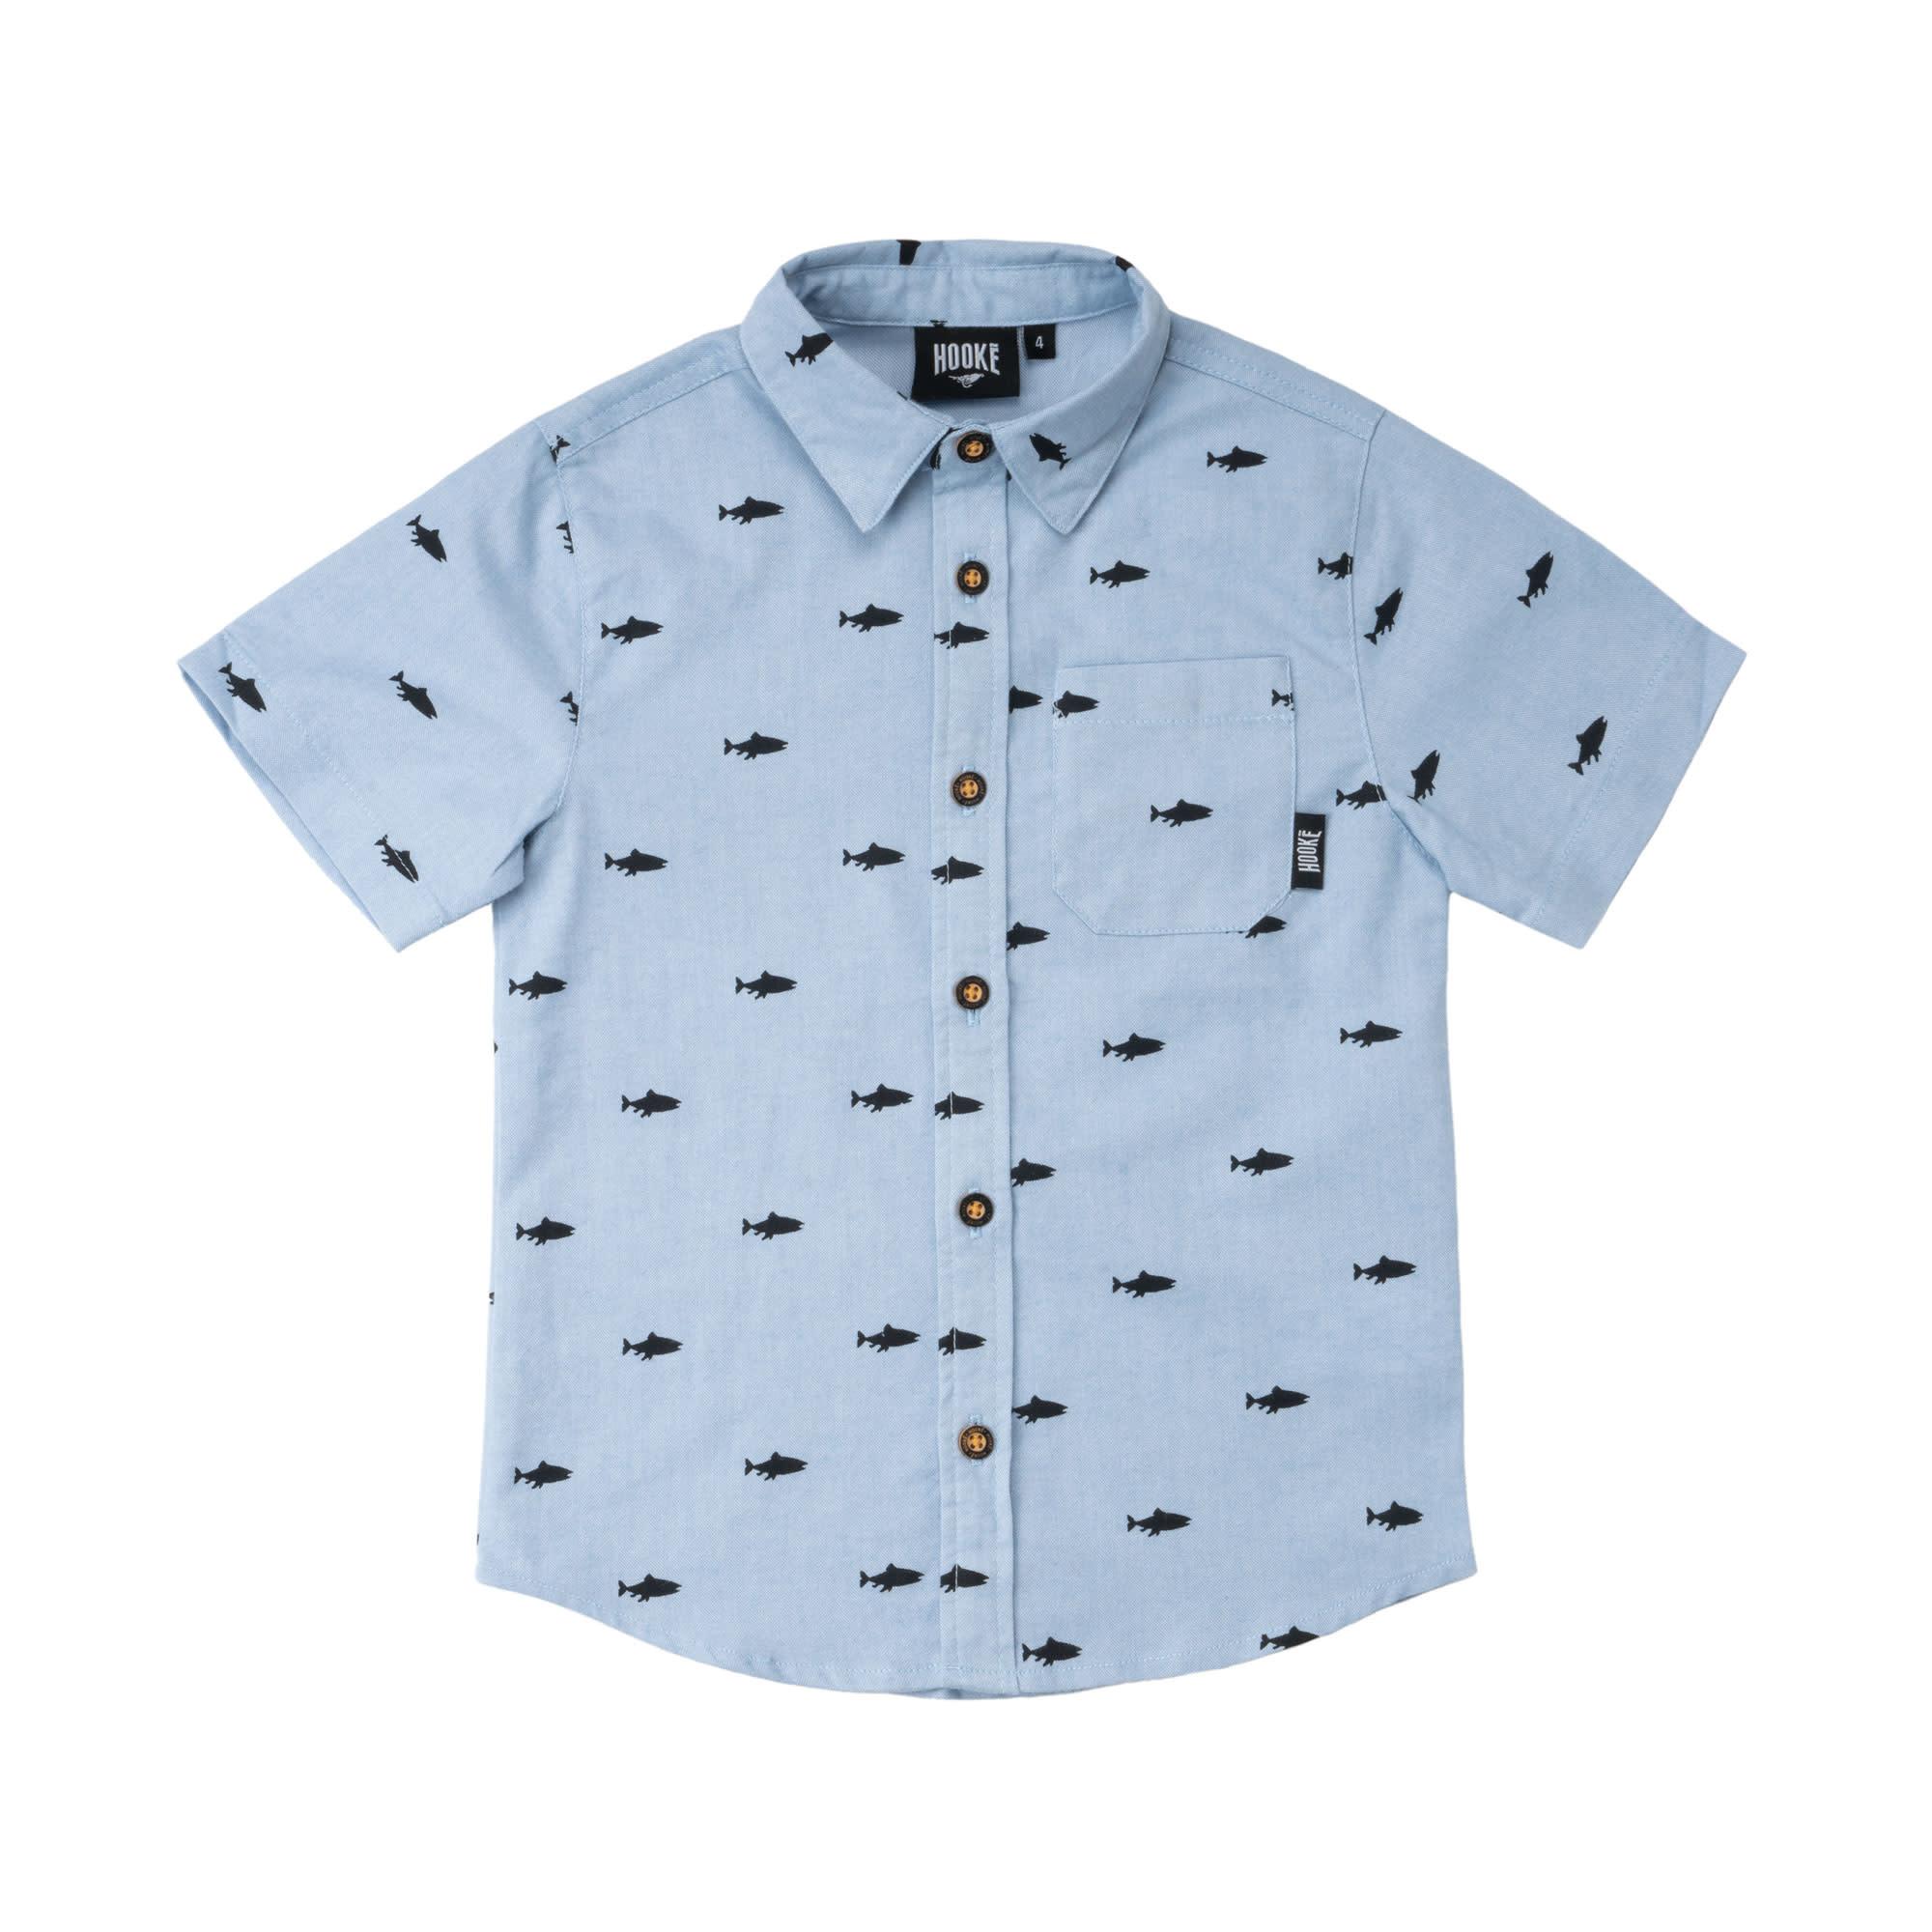 Fish Print Shirt